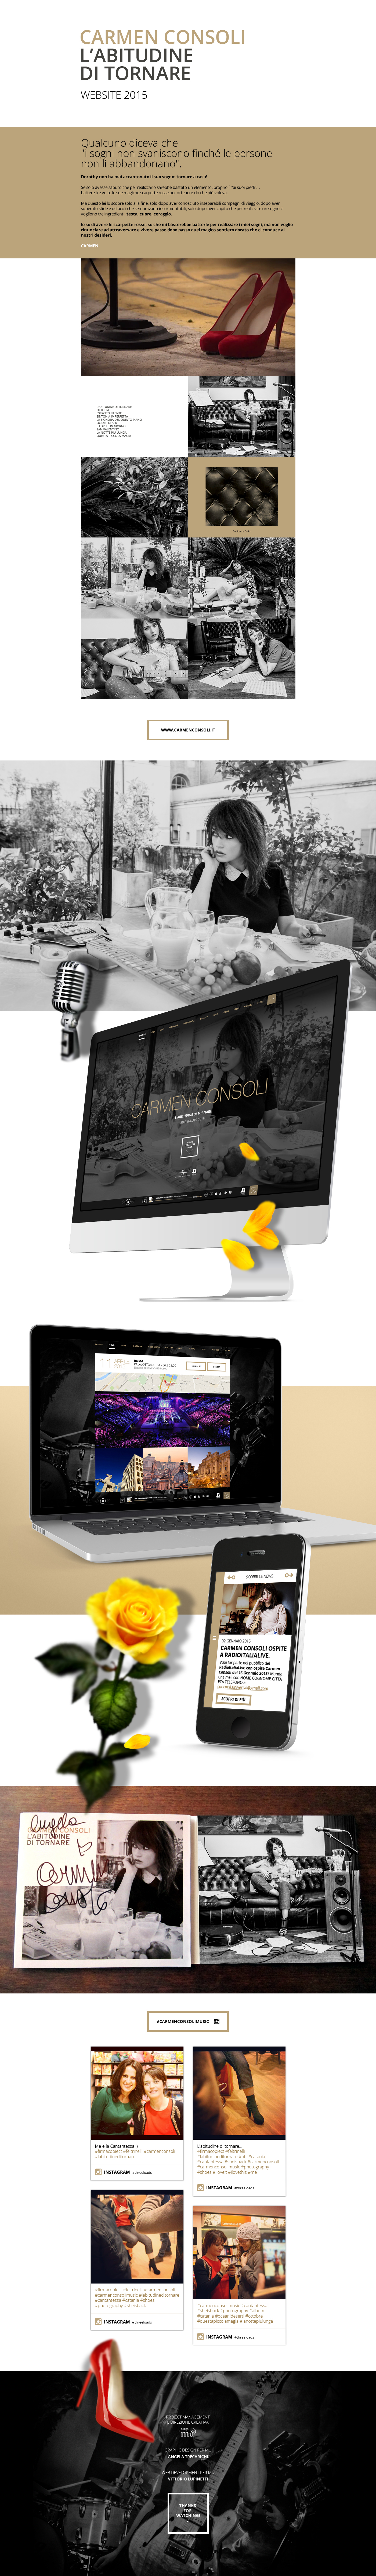 Website Responsive UX design concert carmen consoli live music shooting social universal vevo video discography sicily